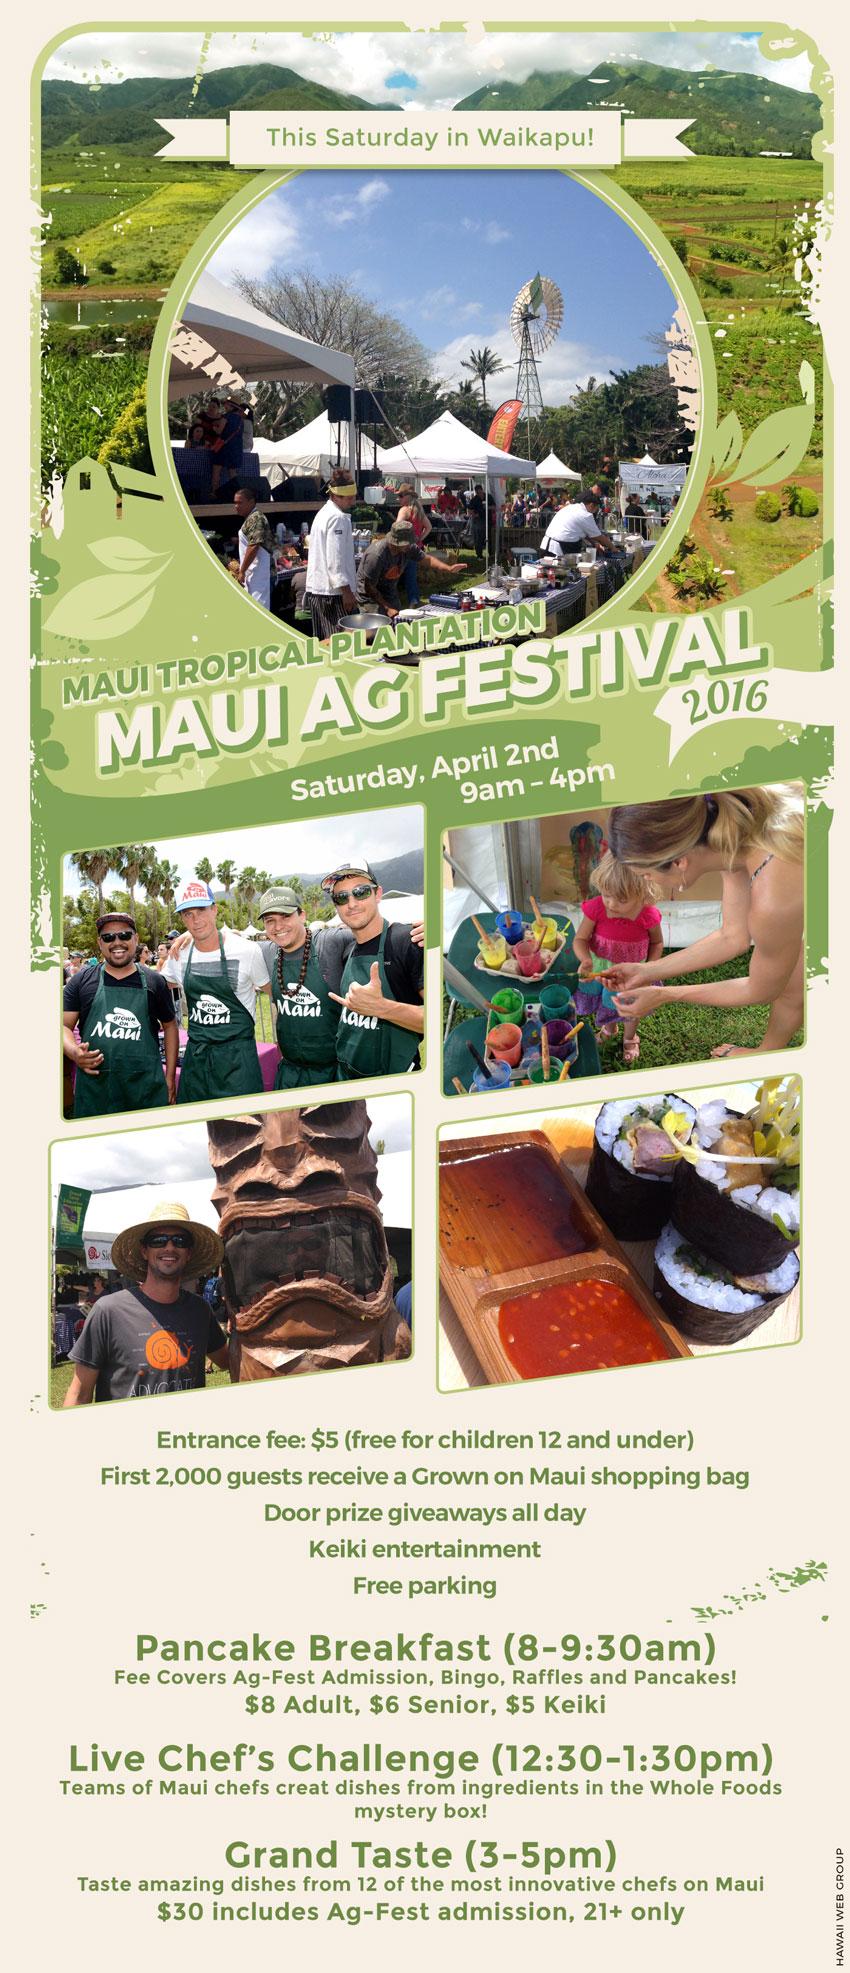 mill house maui ag fest 2016 infographic